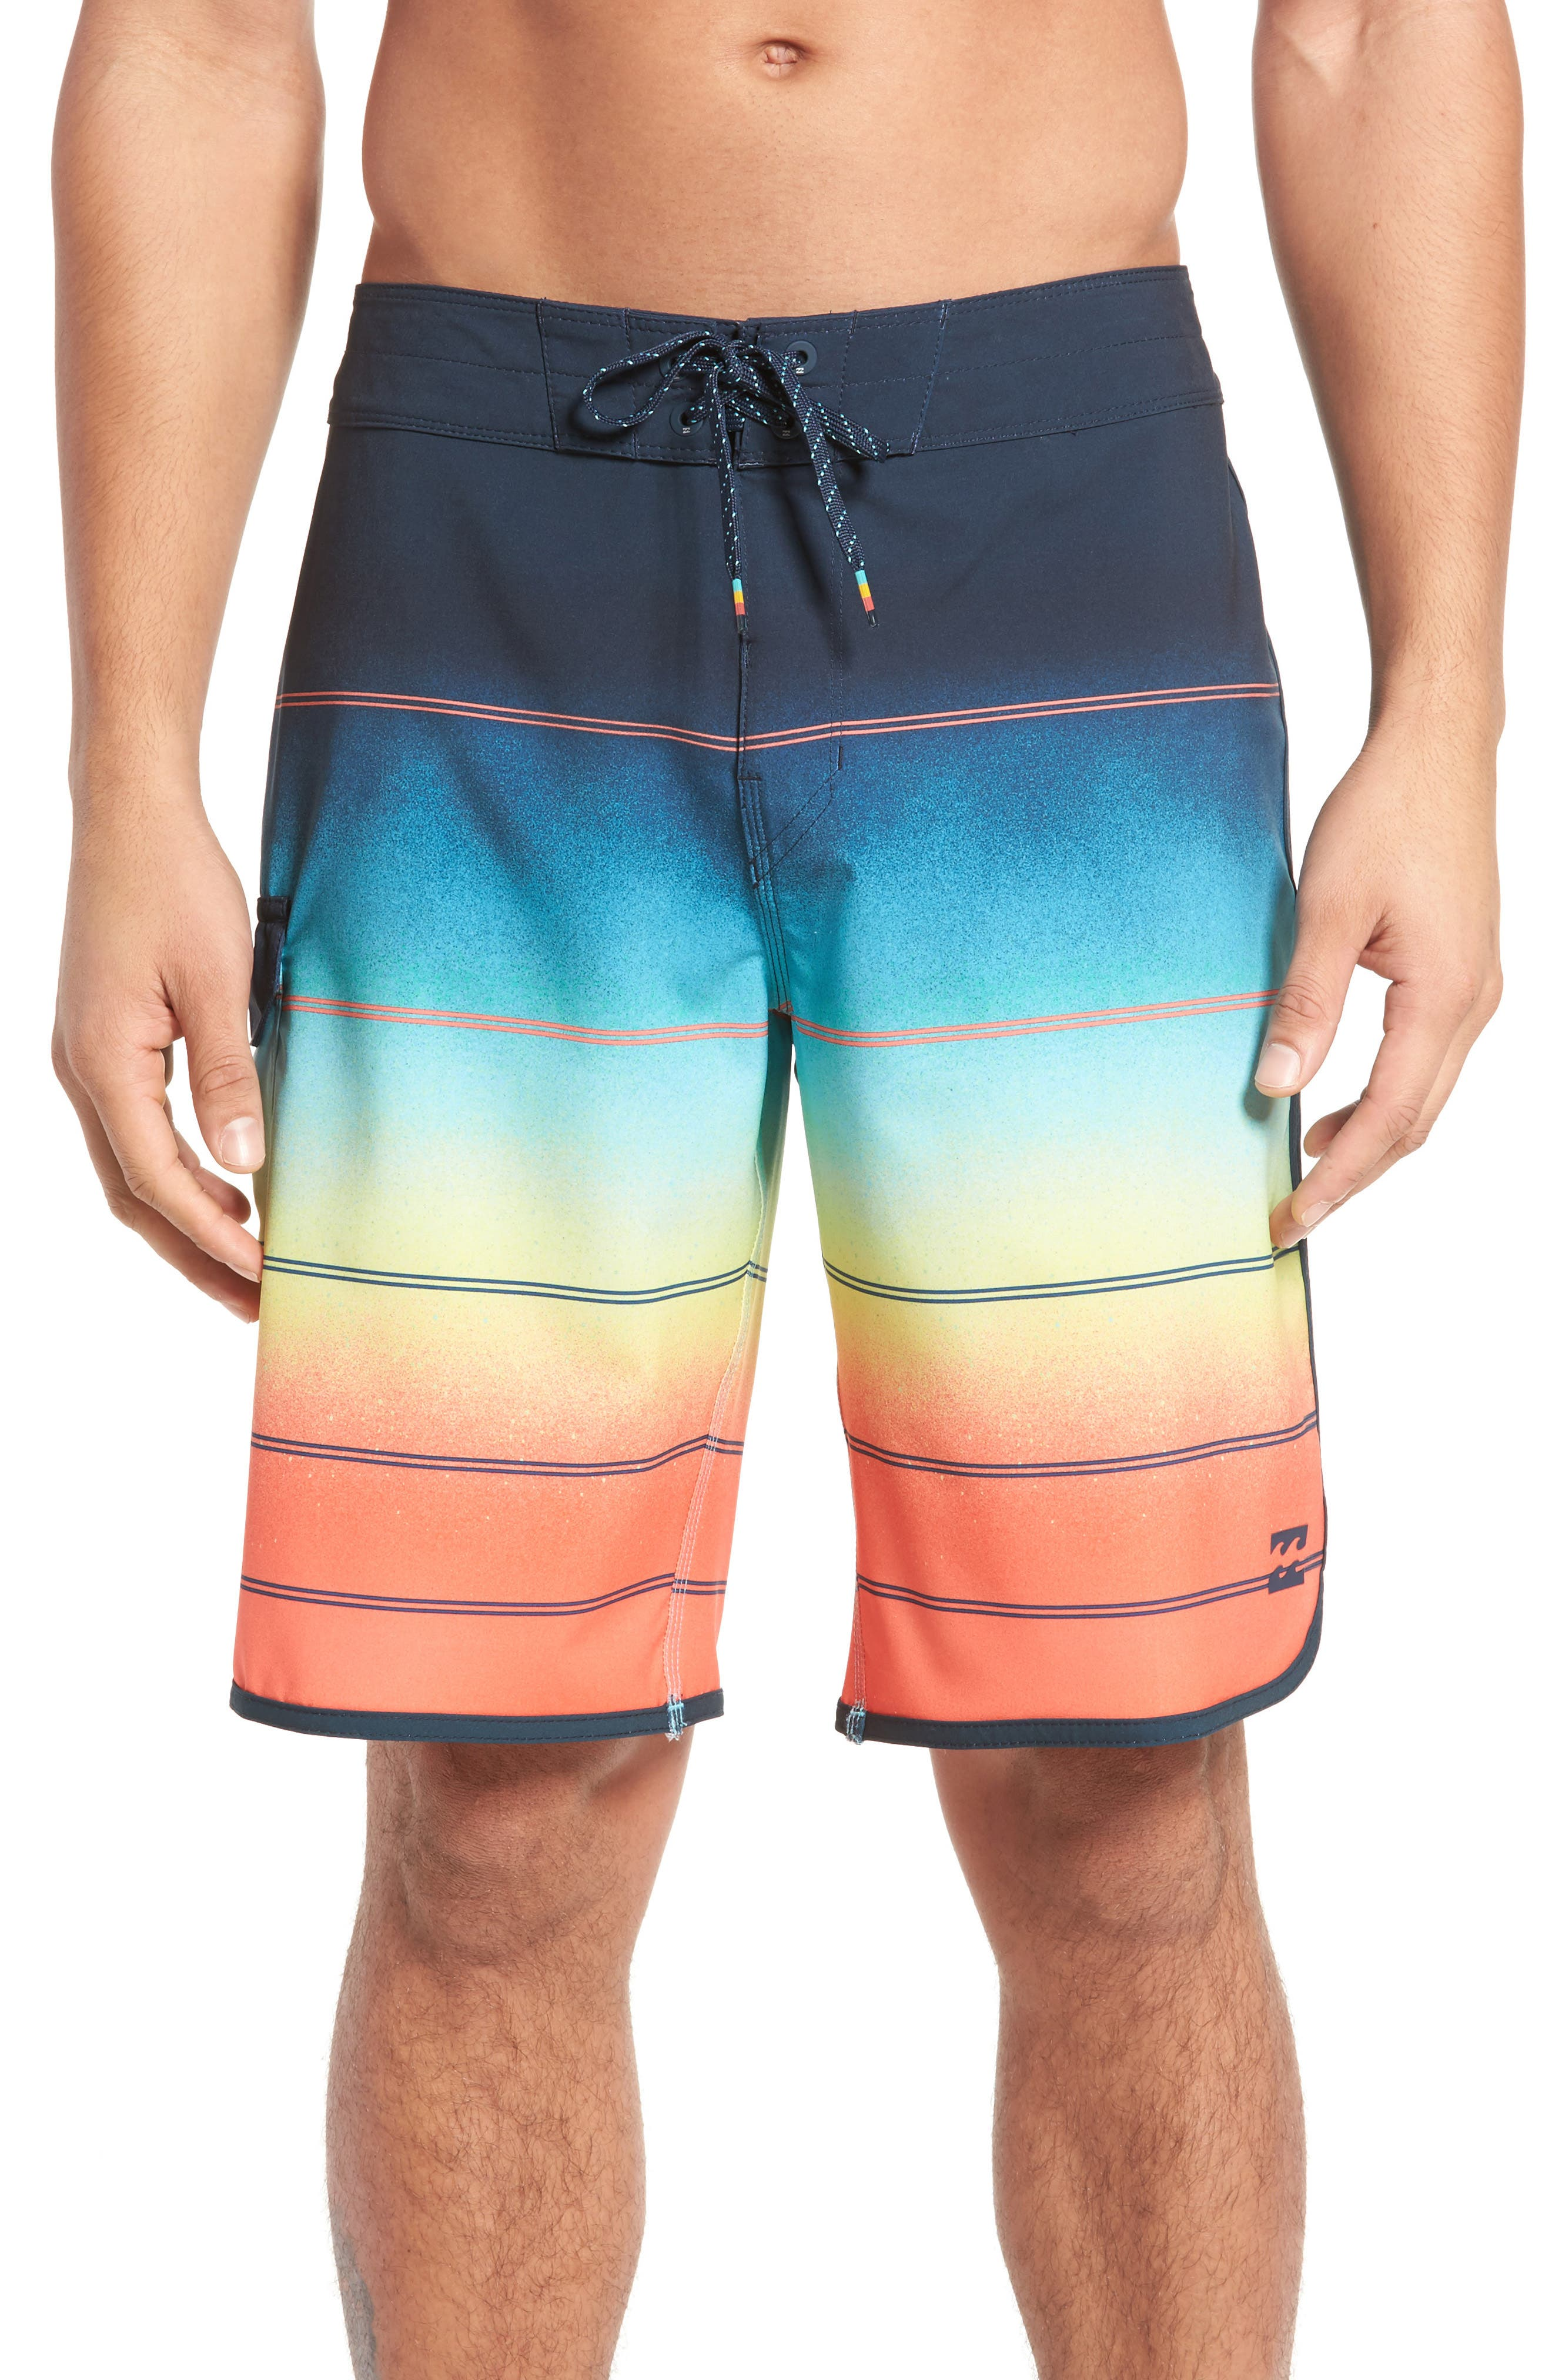 Alternate Image 1 Selected - Billabong 73 X Stripe Board Shorts